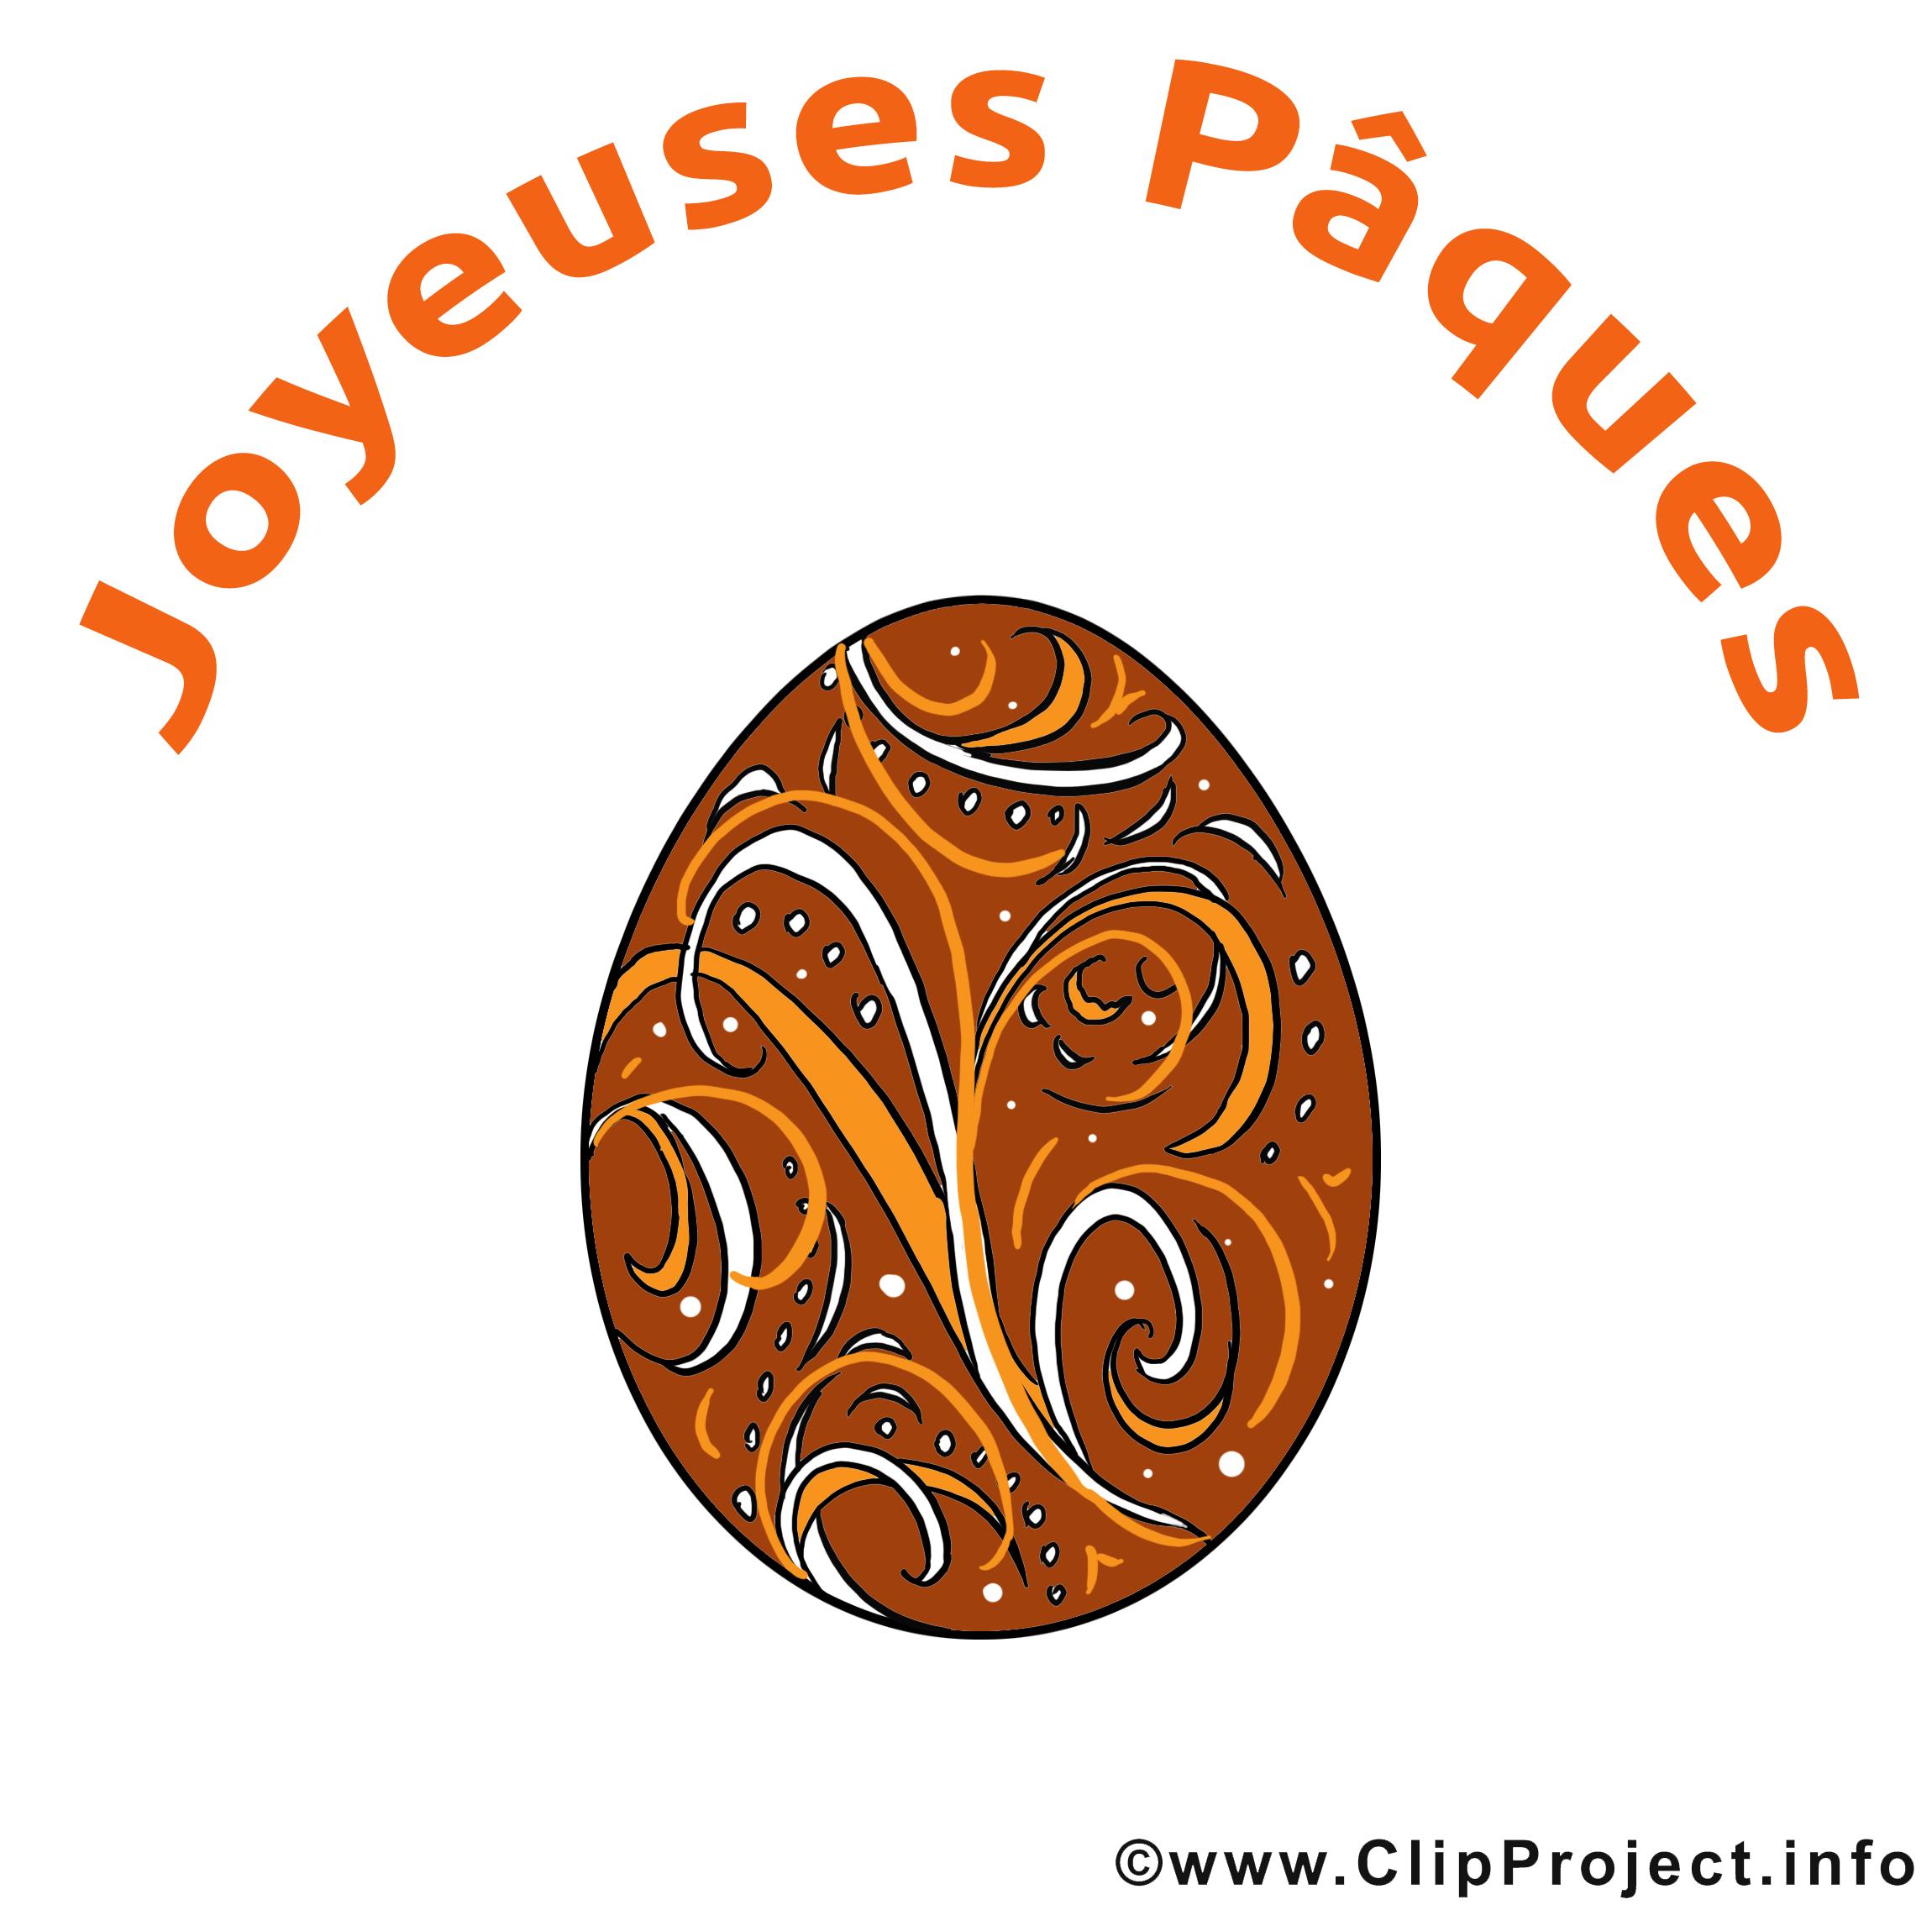 Oeuf image - Pâques images cliparts